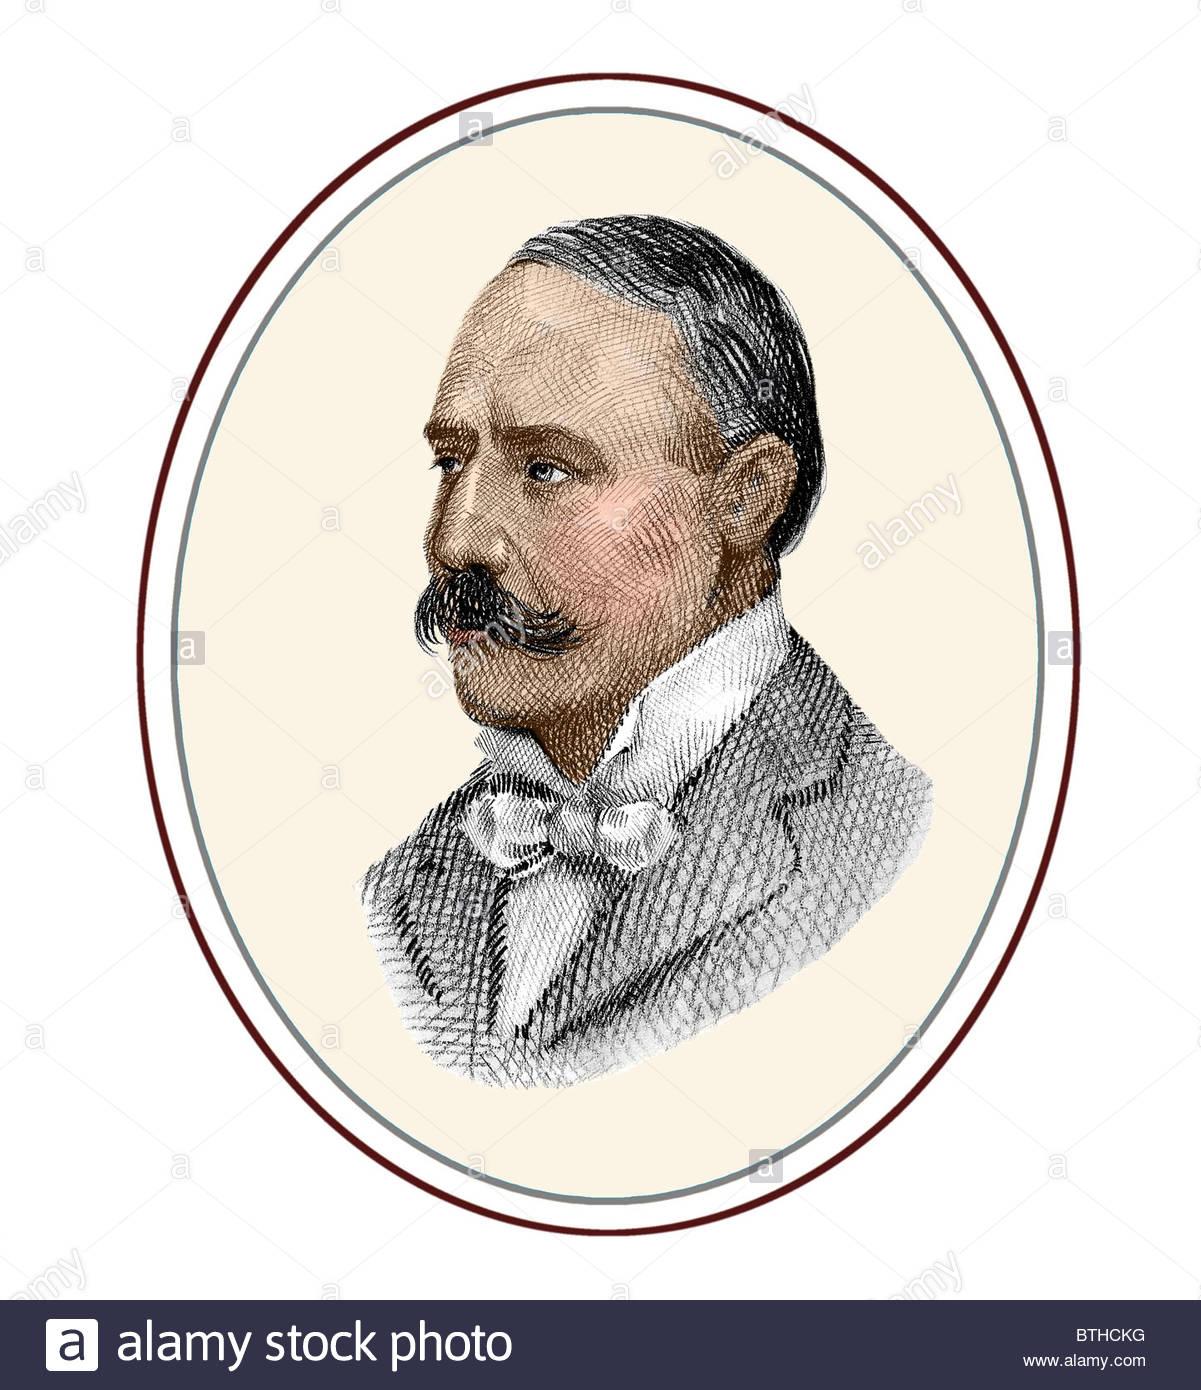 Edward Elgar 1857 1934 English Composer Modern Cross Hatch